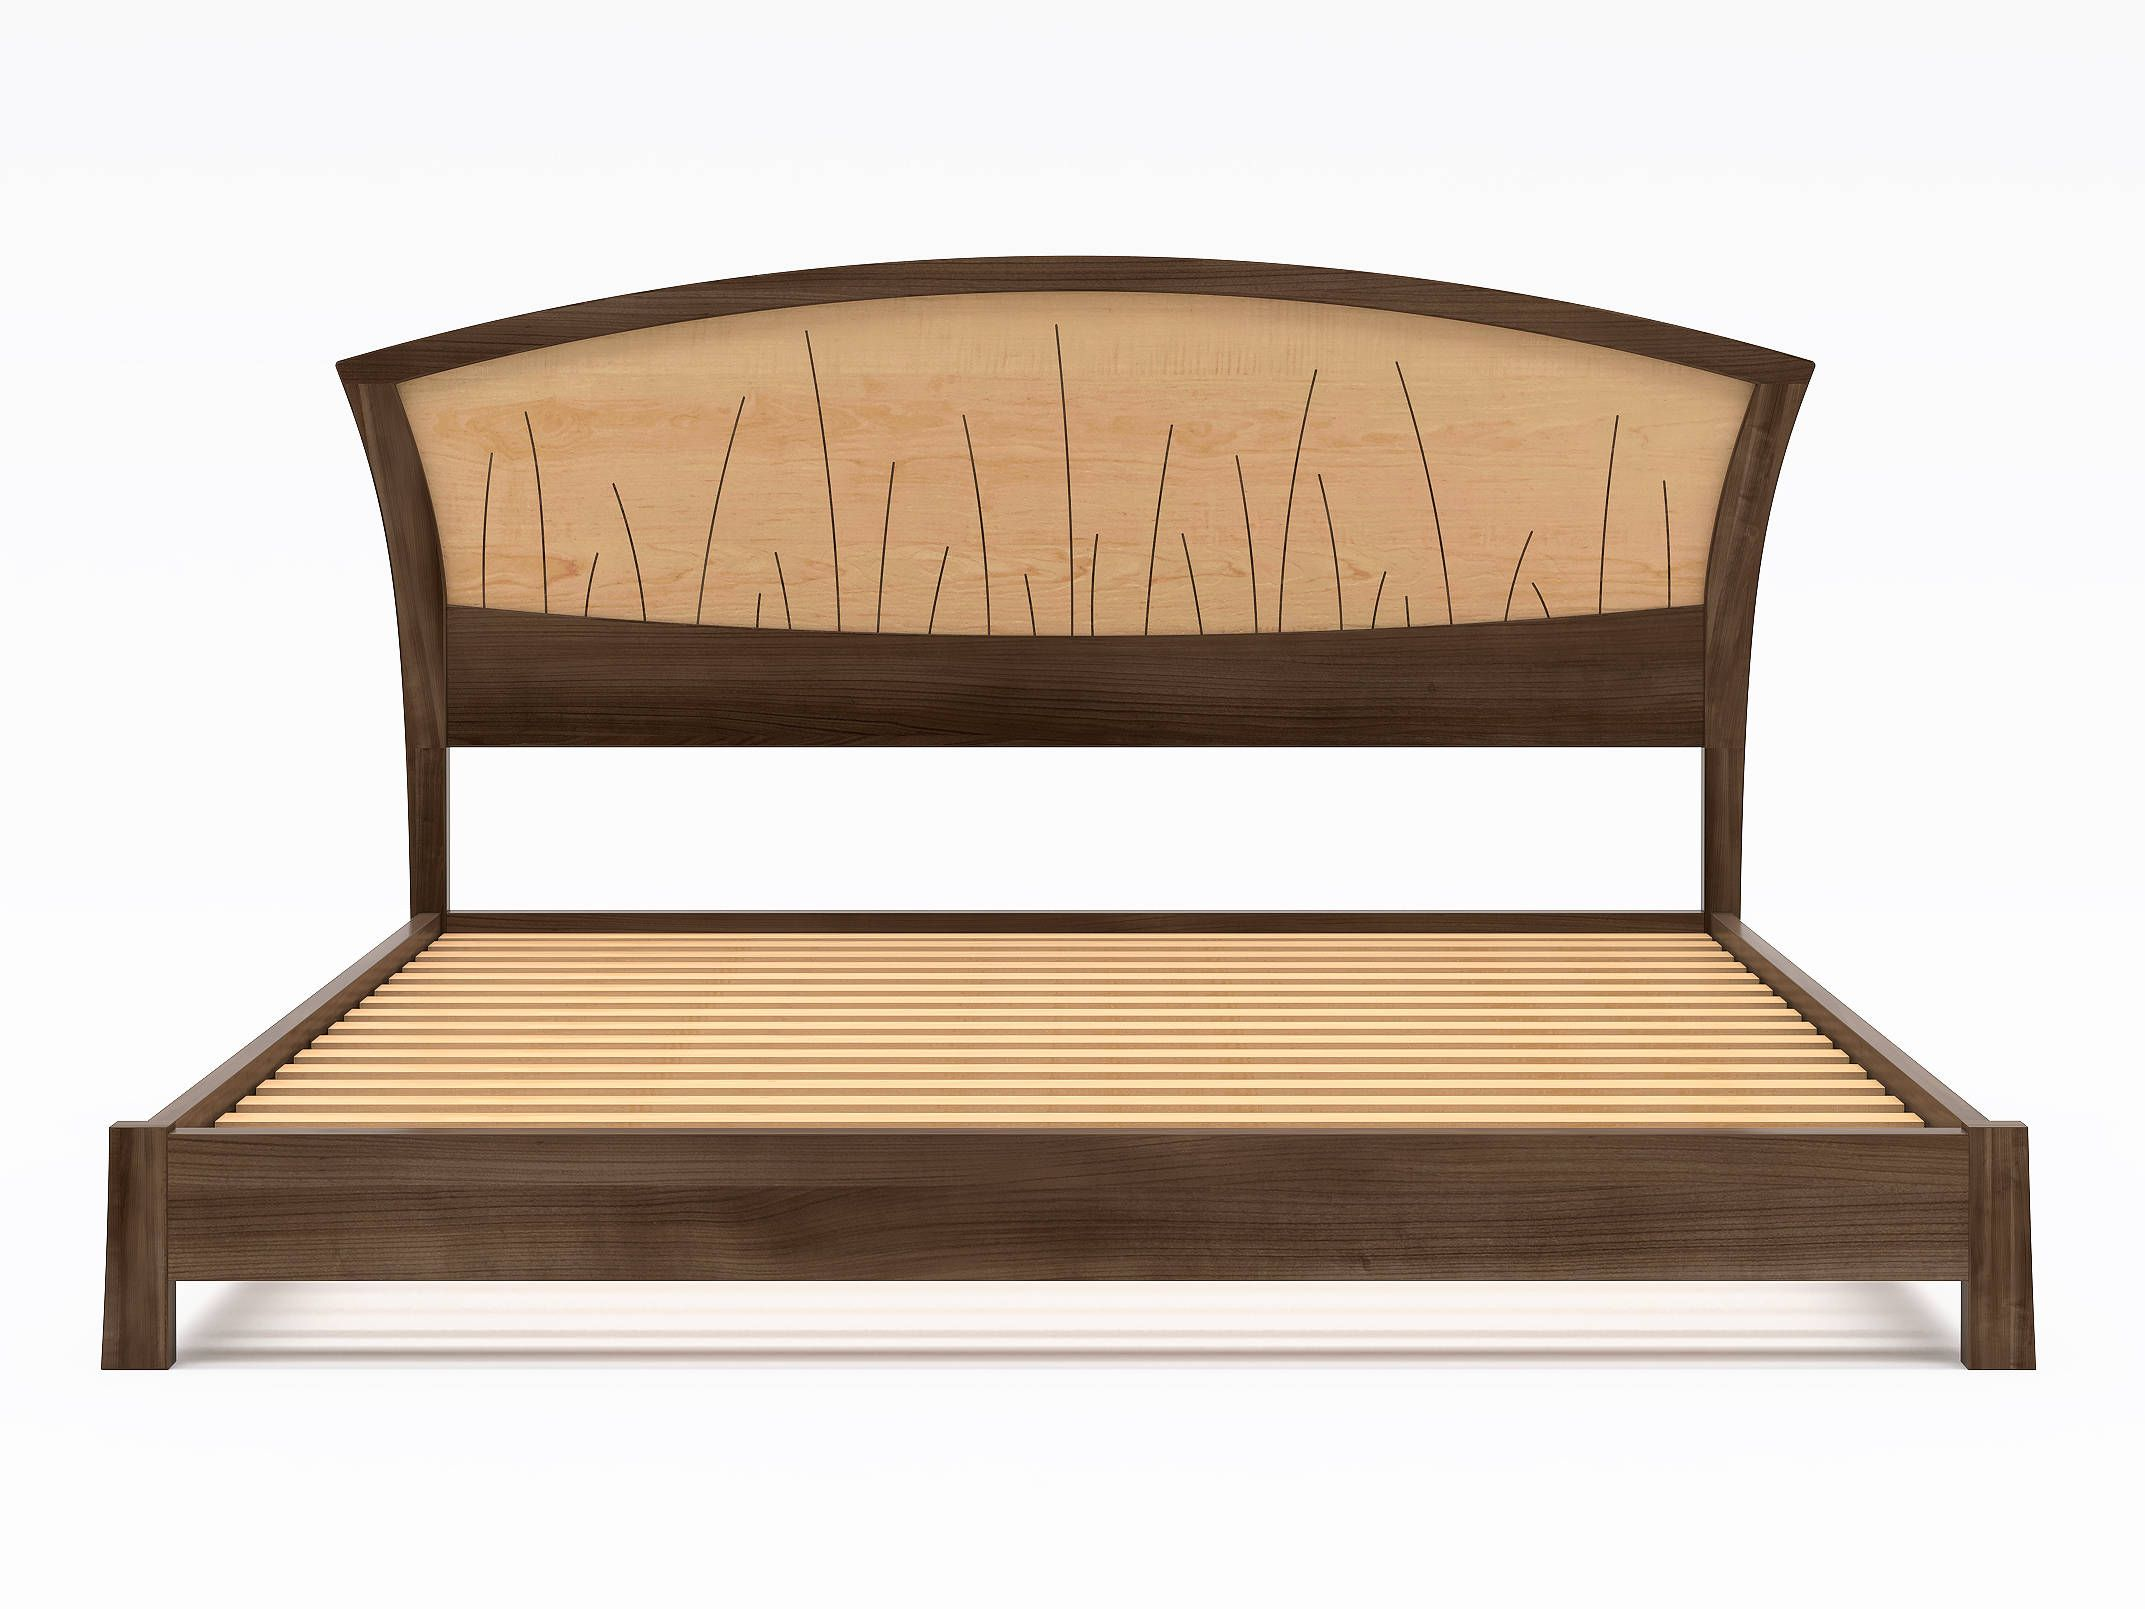 Walnut Platform Bed Queen Size Low Modern Frame Wood Art Deco Headboard King Full Twin California Handmade River Rushes